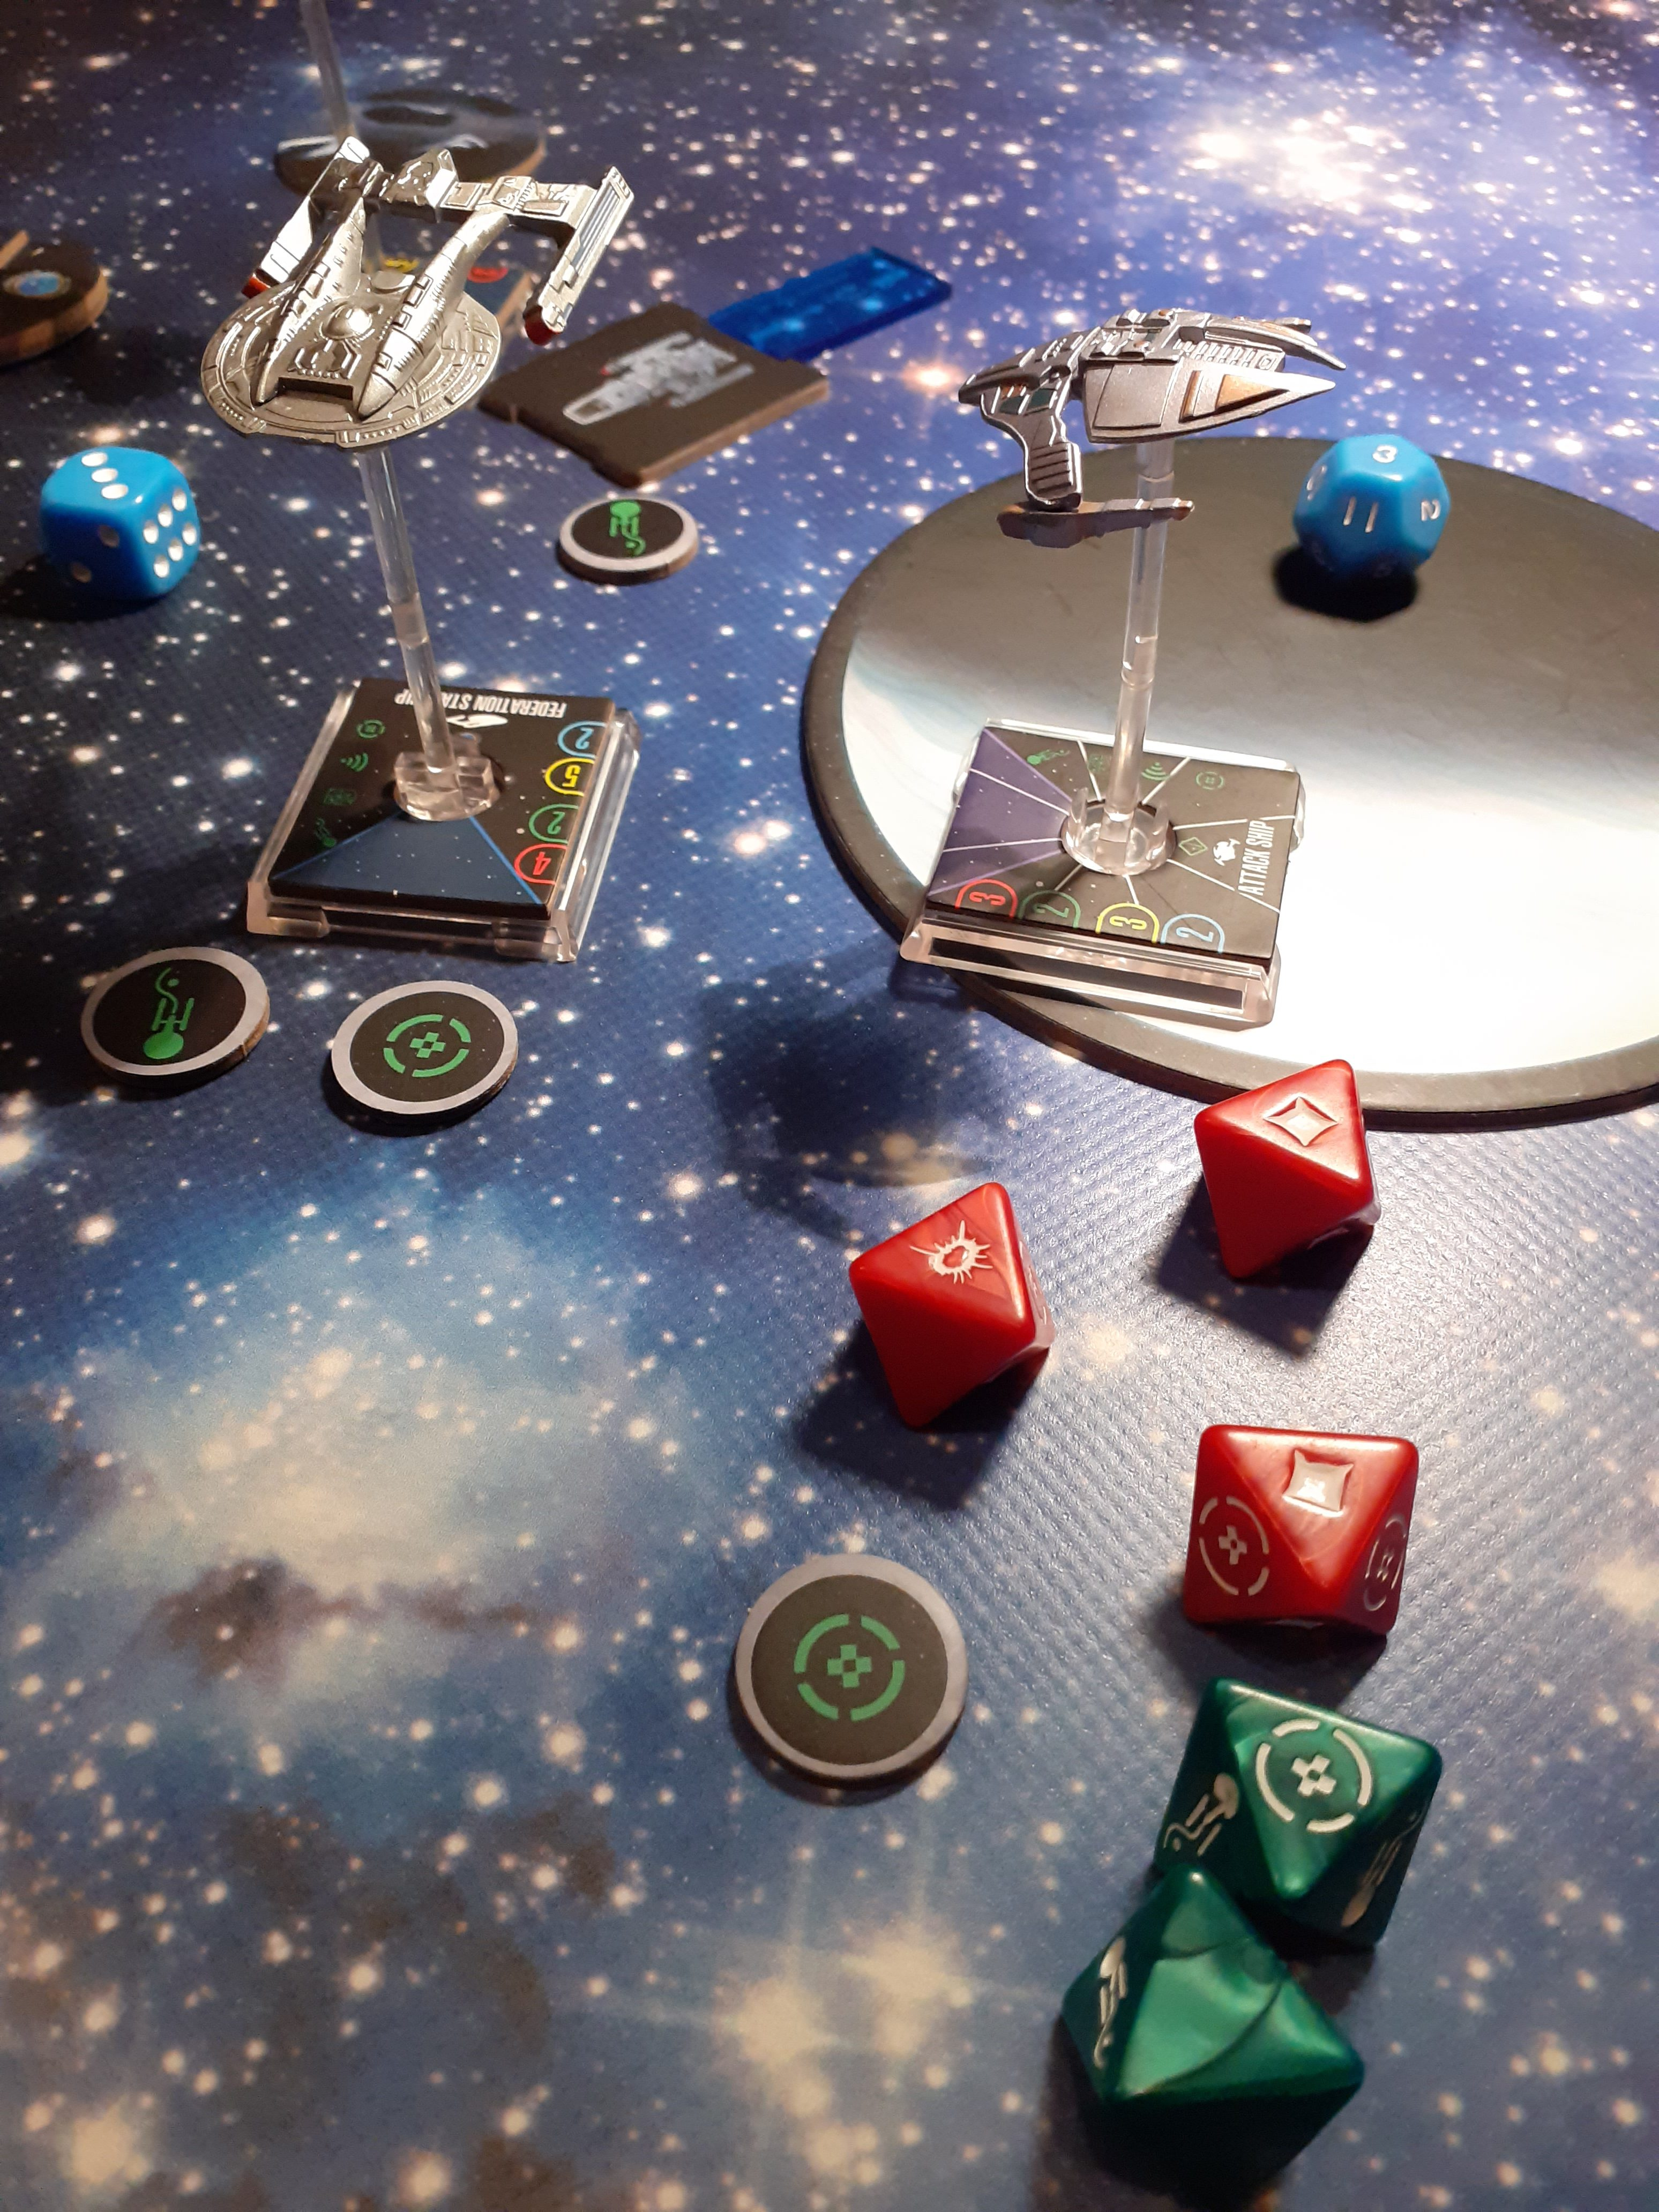 [Star Trek Alliance - Dominion War Campaign I] Computerlogbuch der Solo-Kampagne von Commander Cut  20210403_013139-e1617446597648